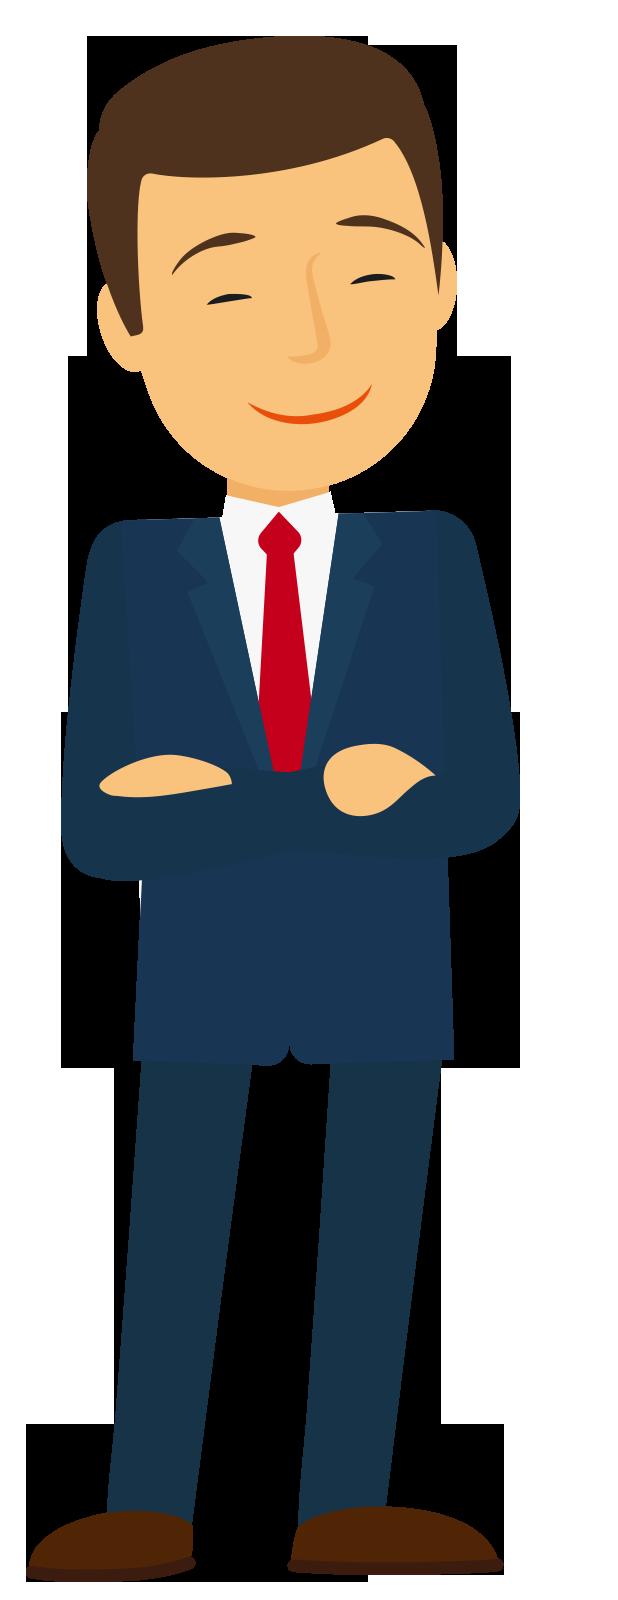 Professional clipart male professional. Illustration smiling man transprent